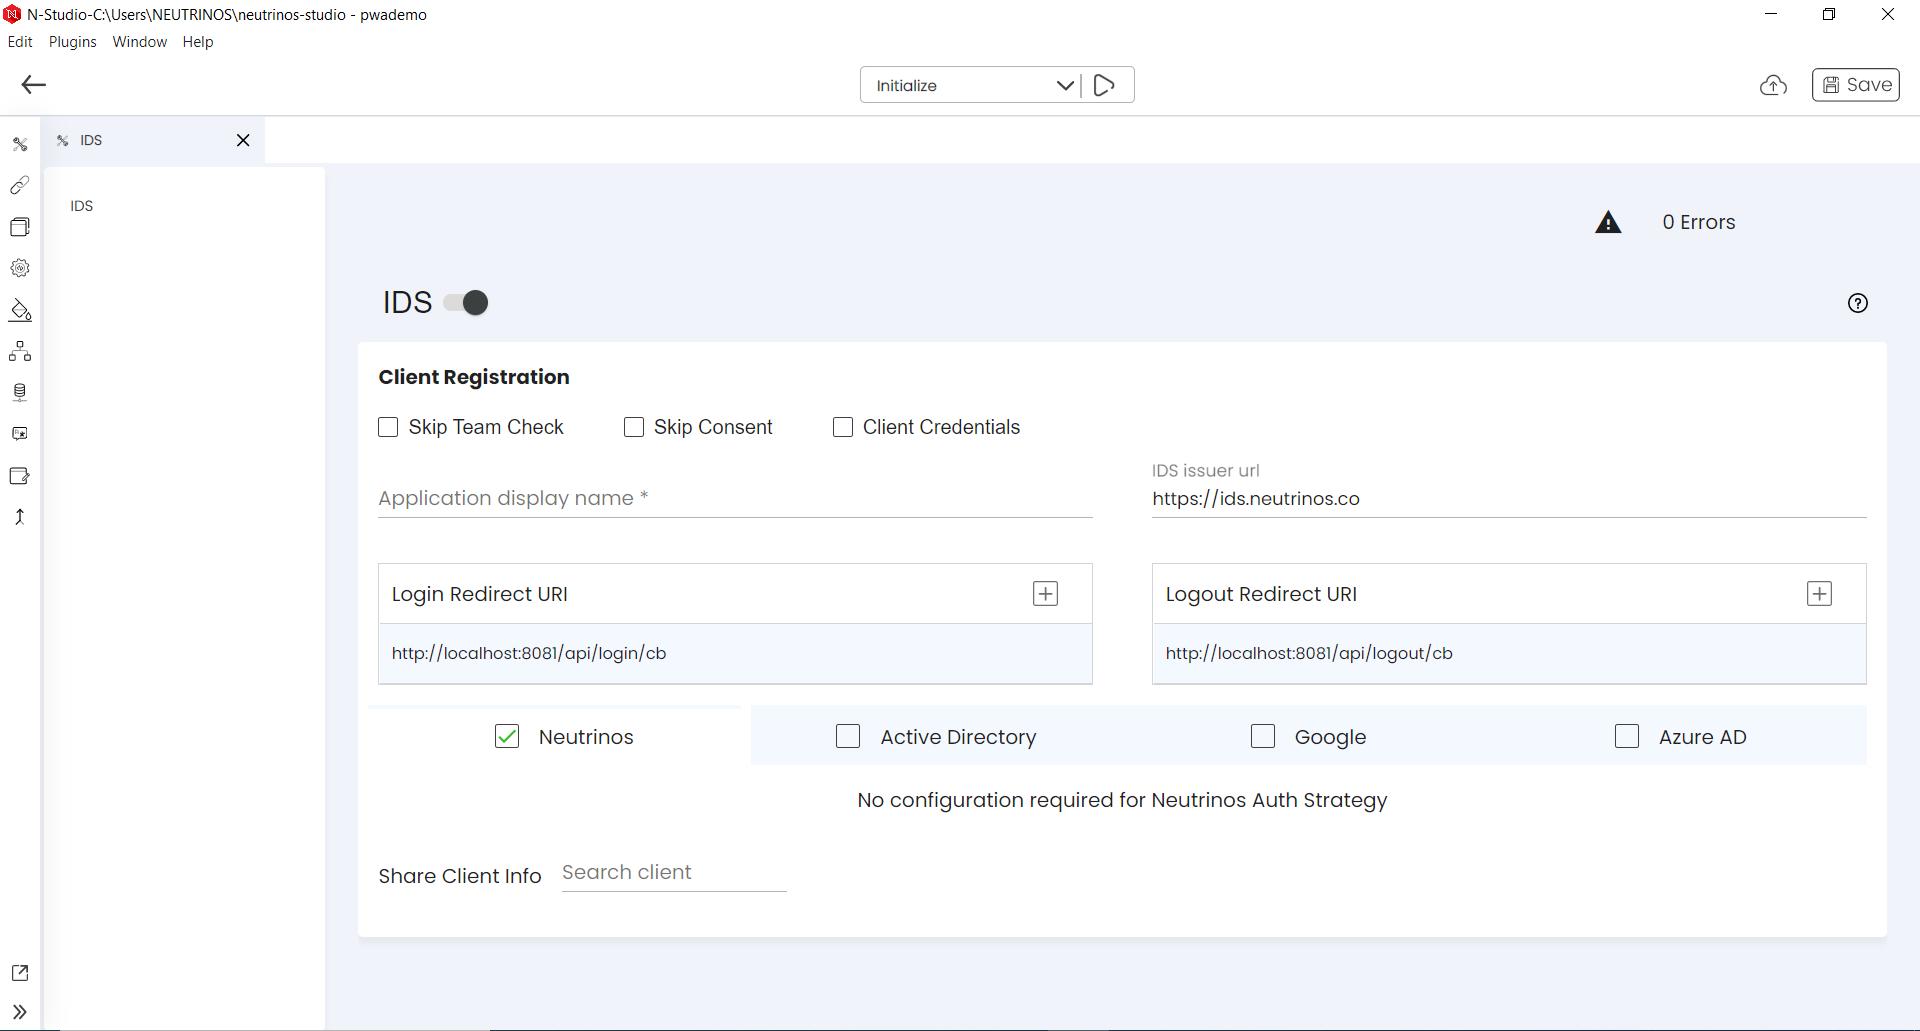 Neutrinos IDS Configuration Page